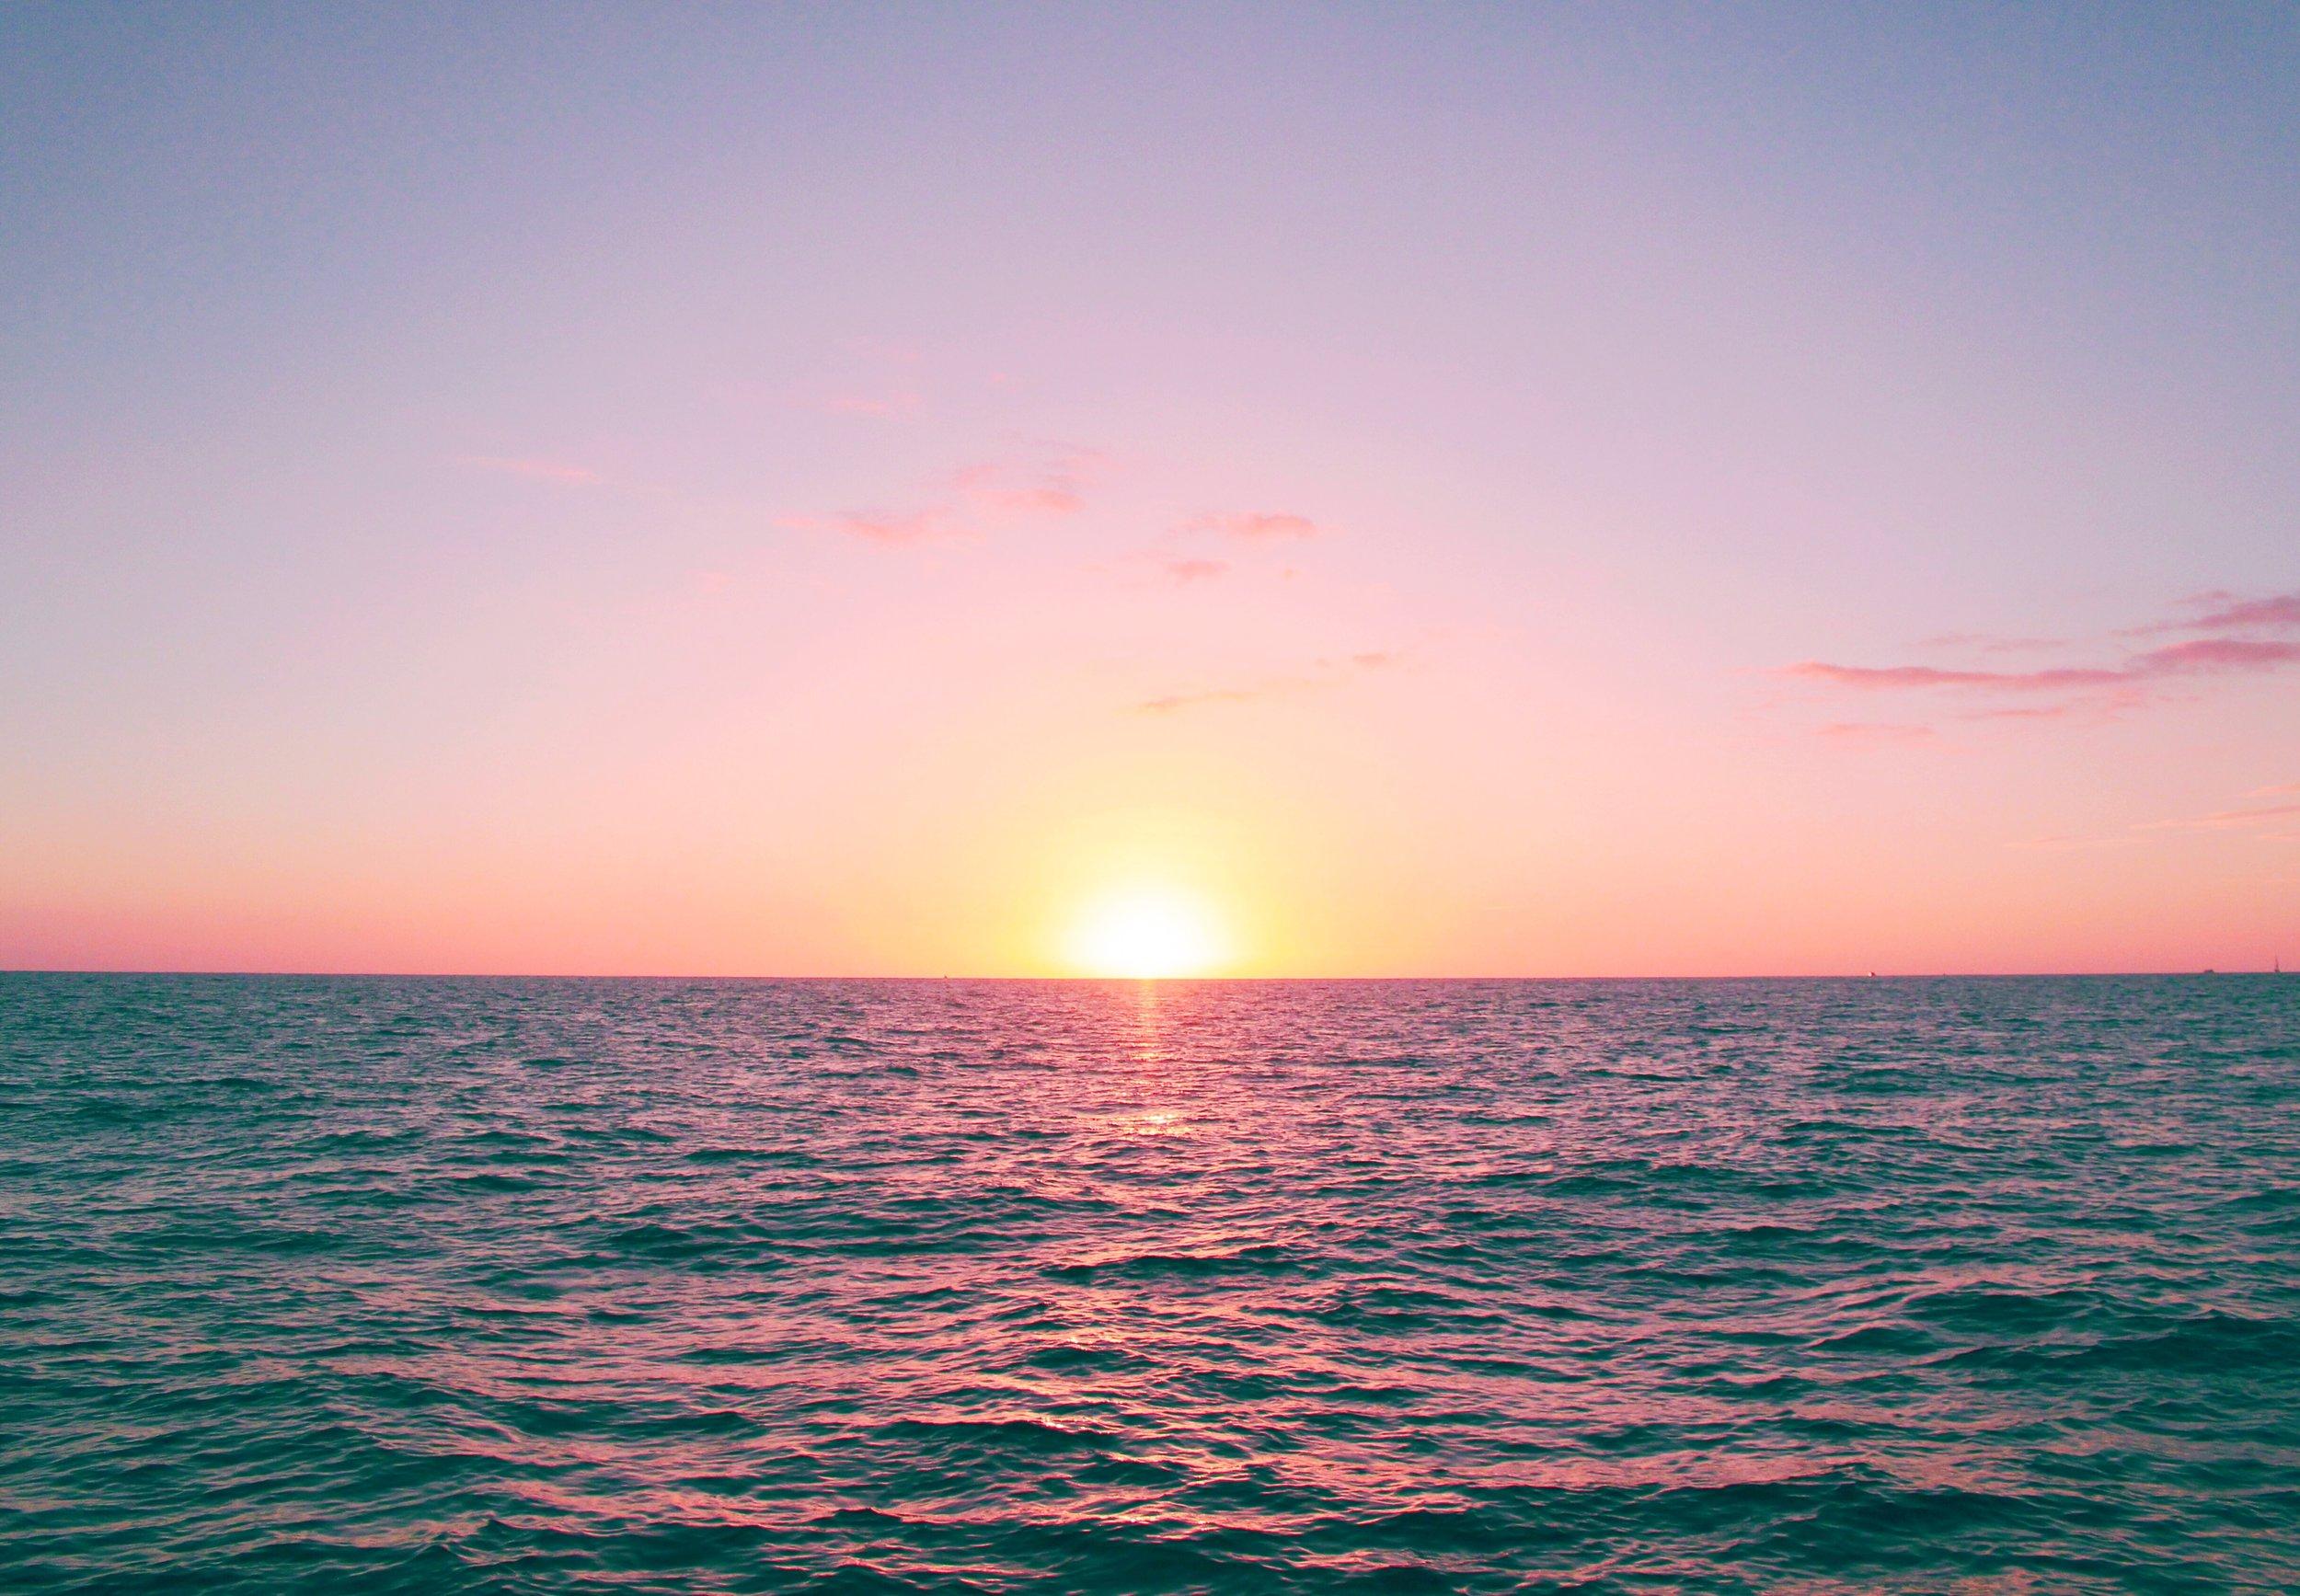 Sunset Sailing Cruise with Cabo Sailing